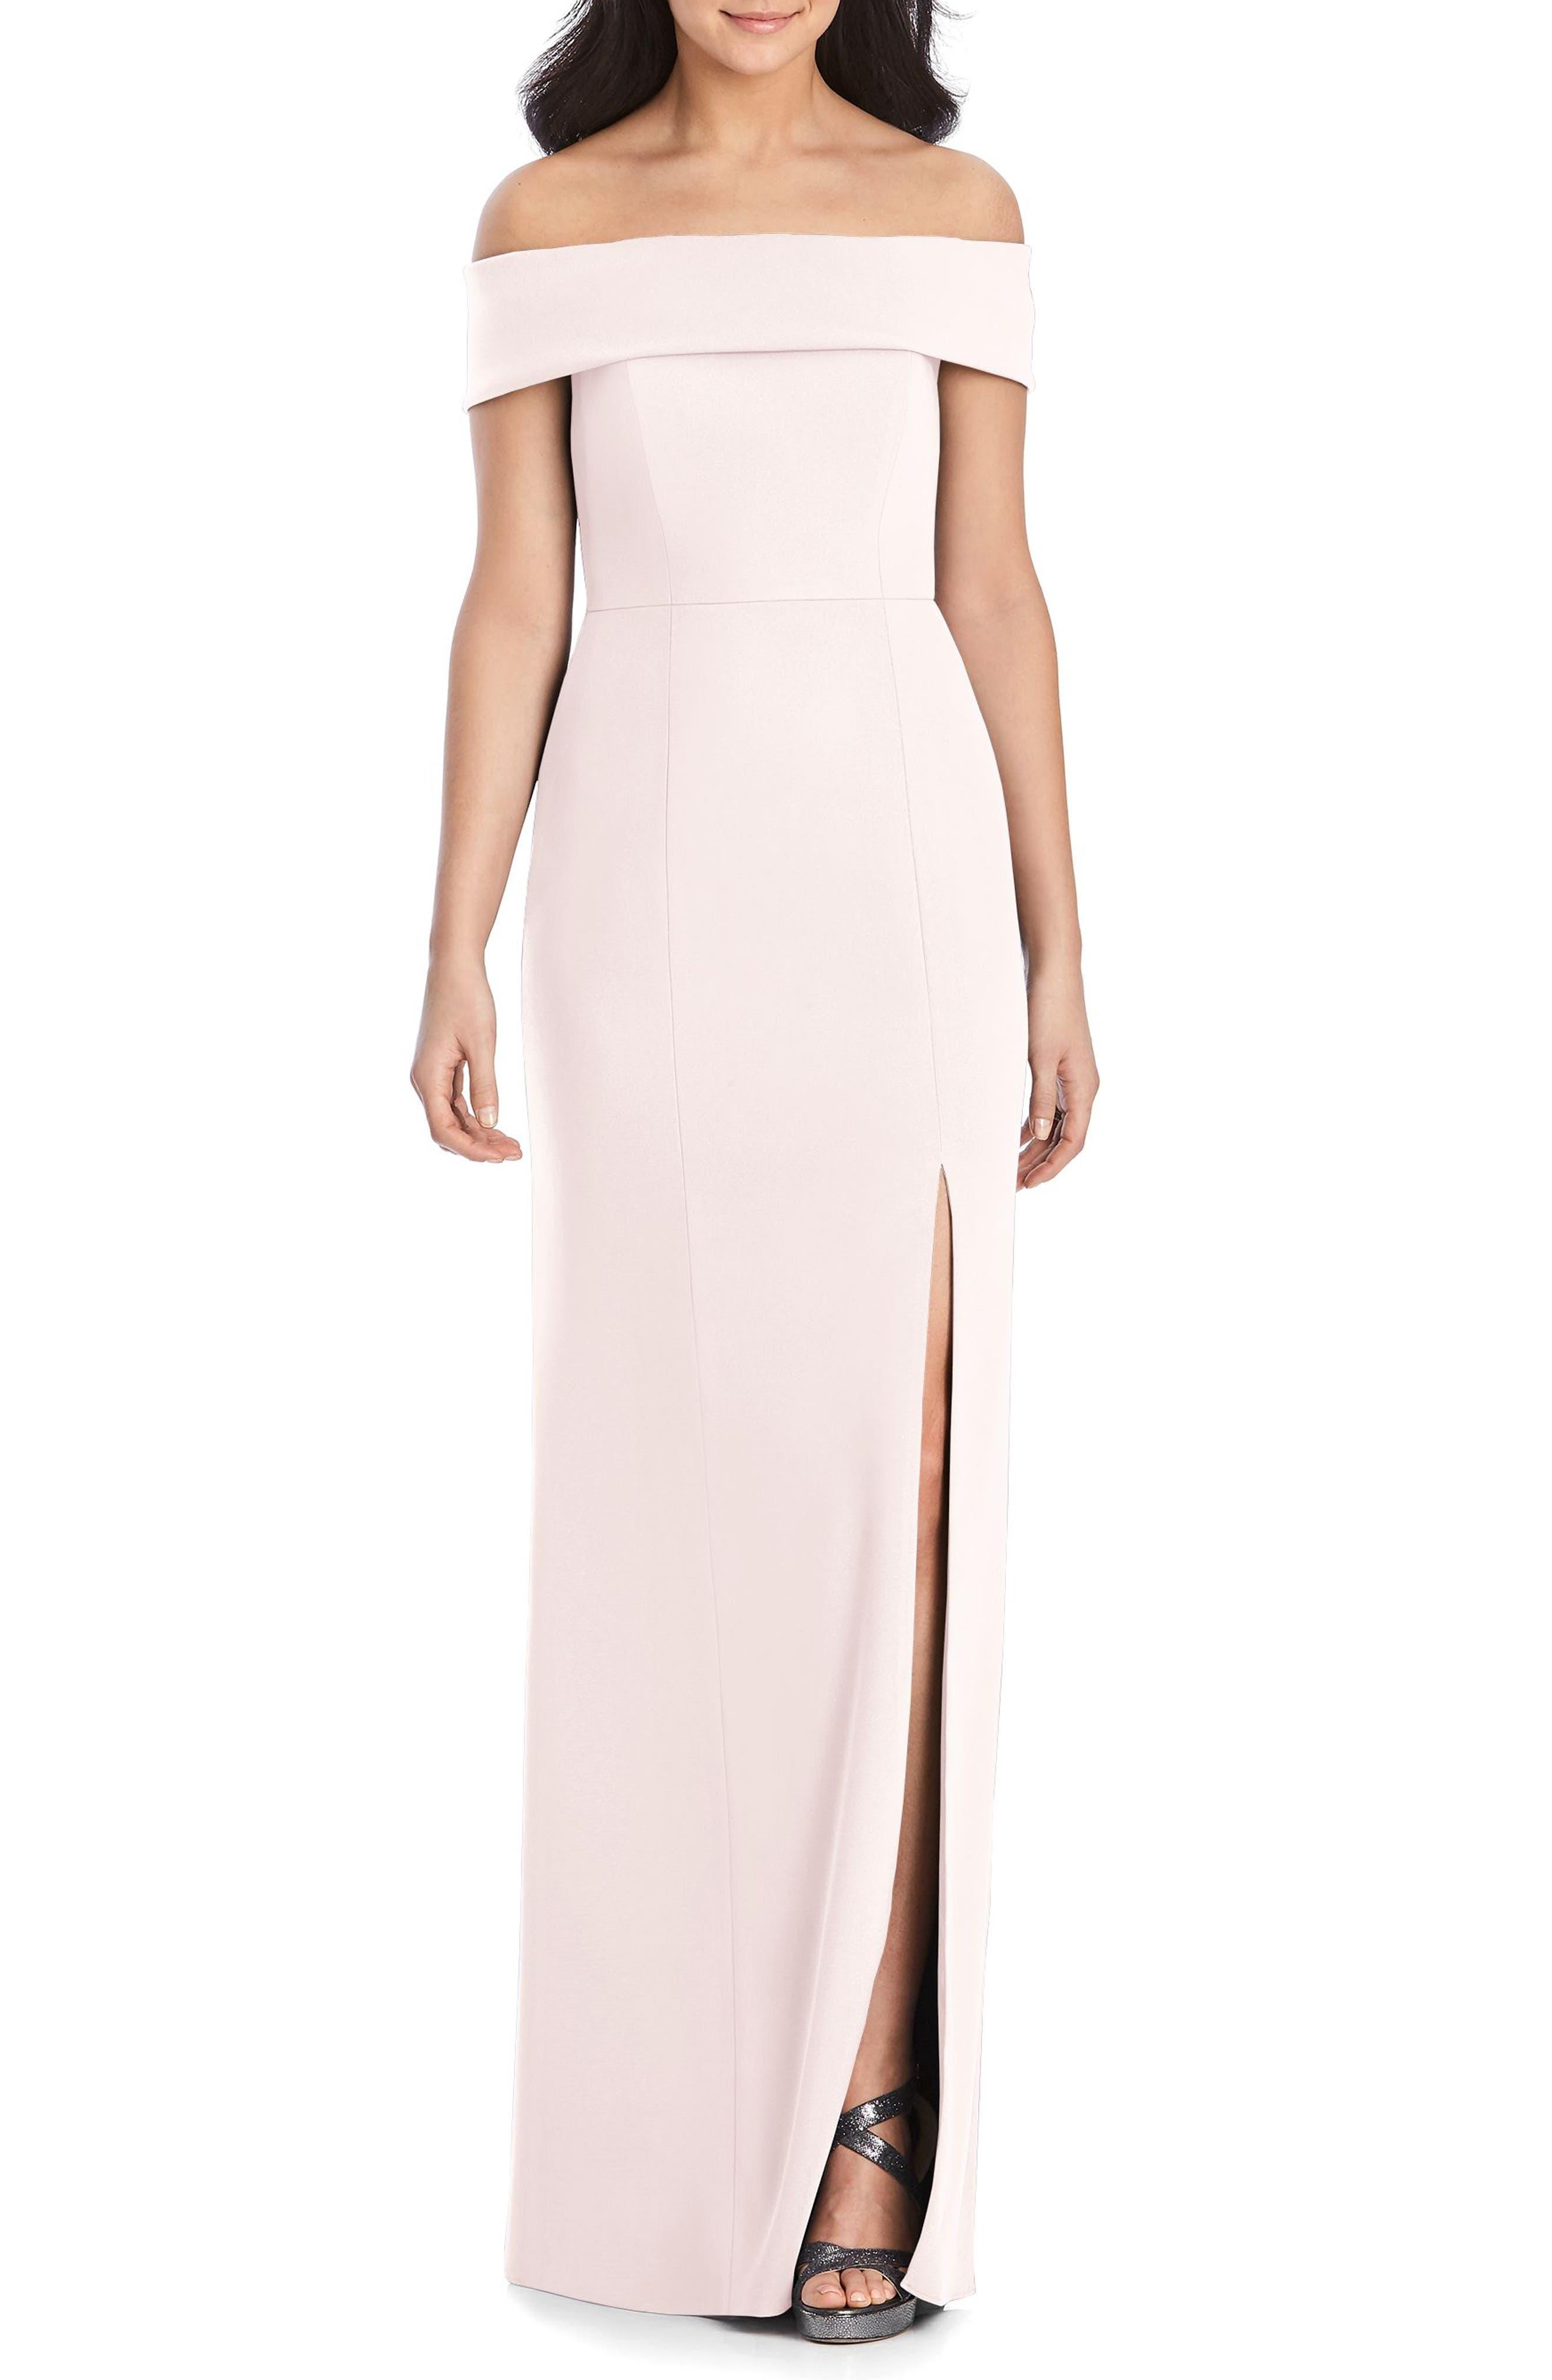 DESSY COLLECTION, Off the Shoulder Side Slit Crepe Gown, Main thumbnail 1, color, BLUSH